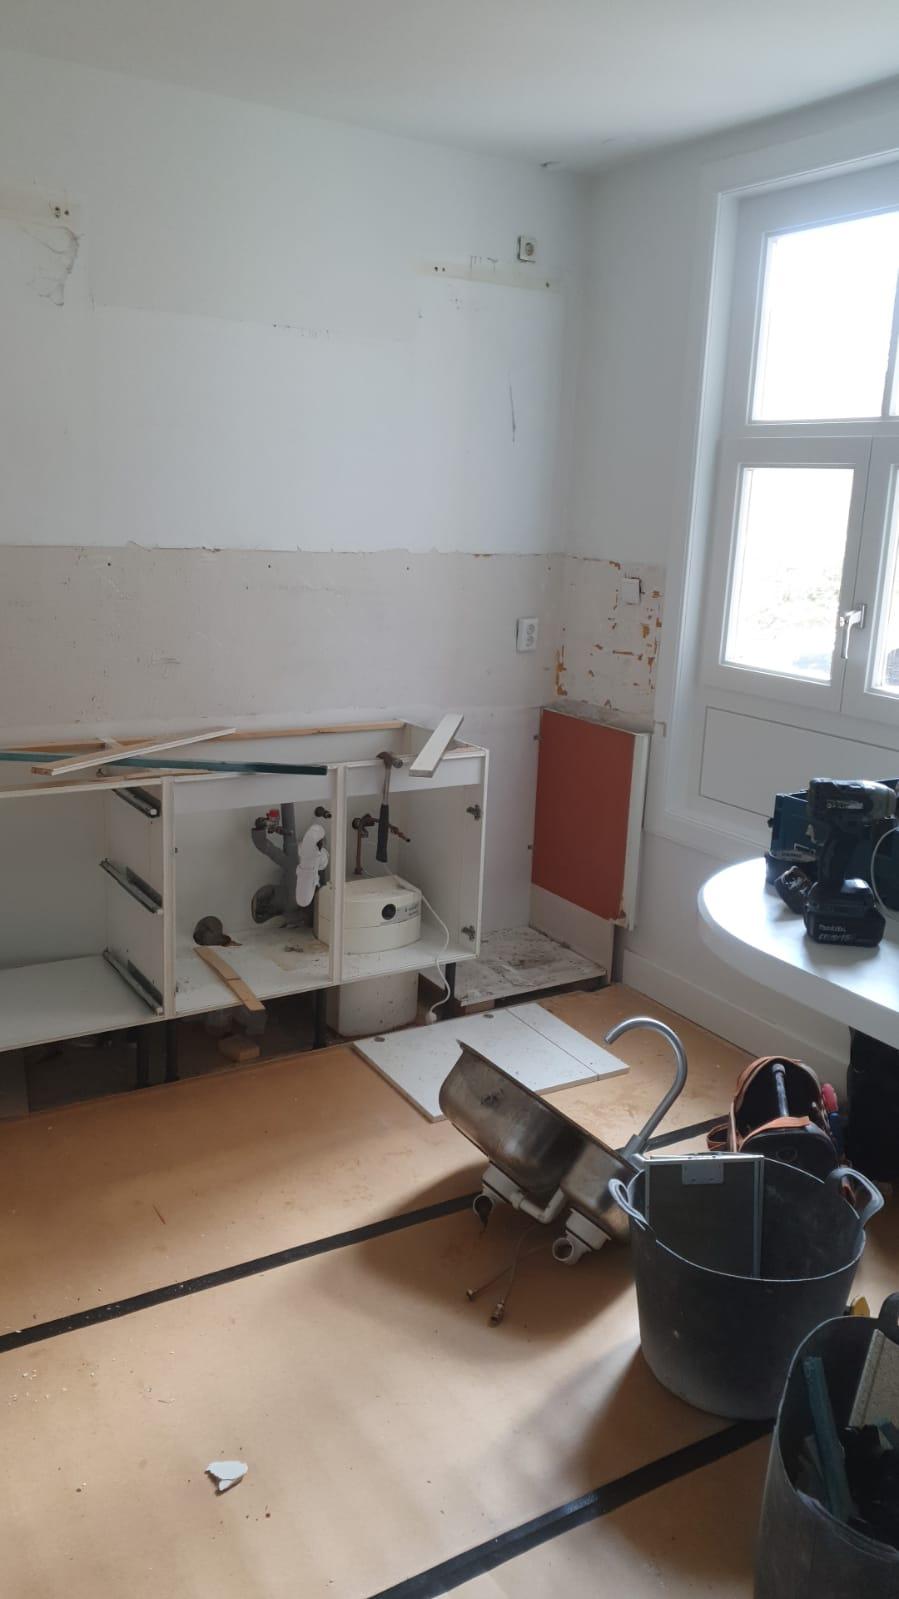 Keuken demontage Amsterdam Pieter Kuiper